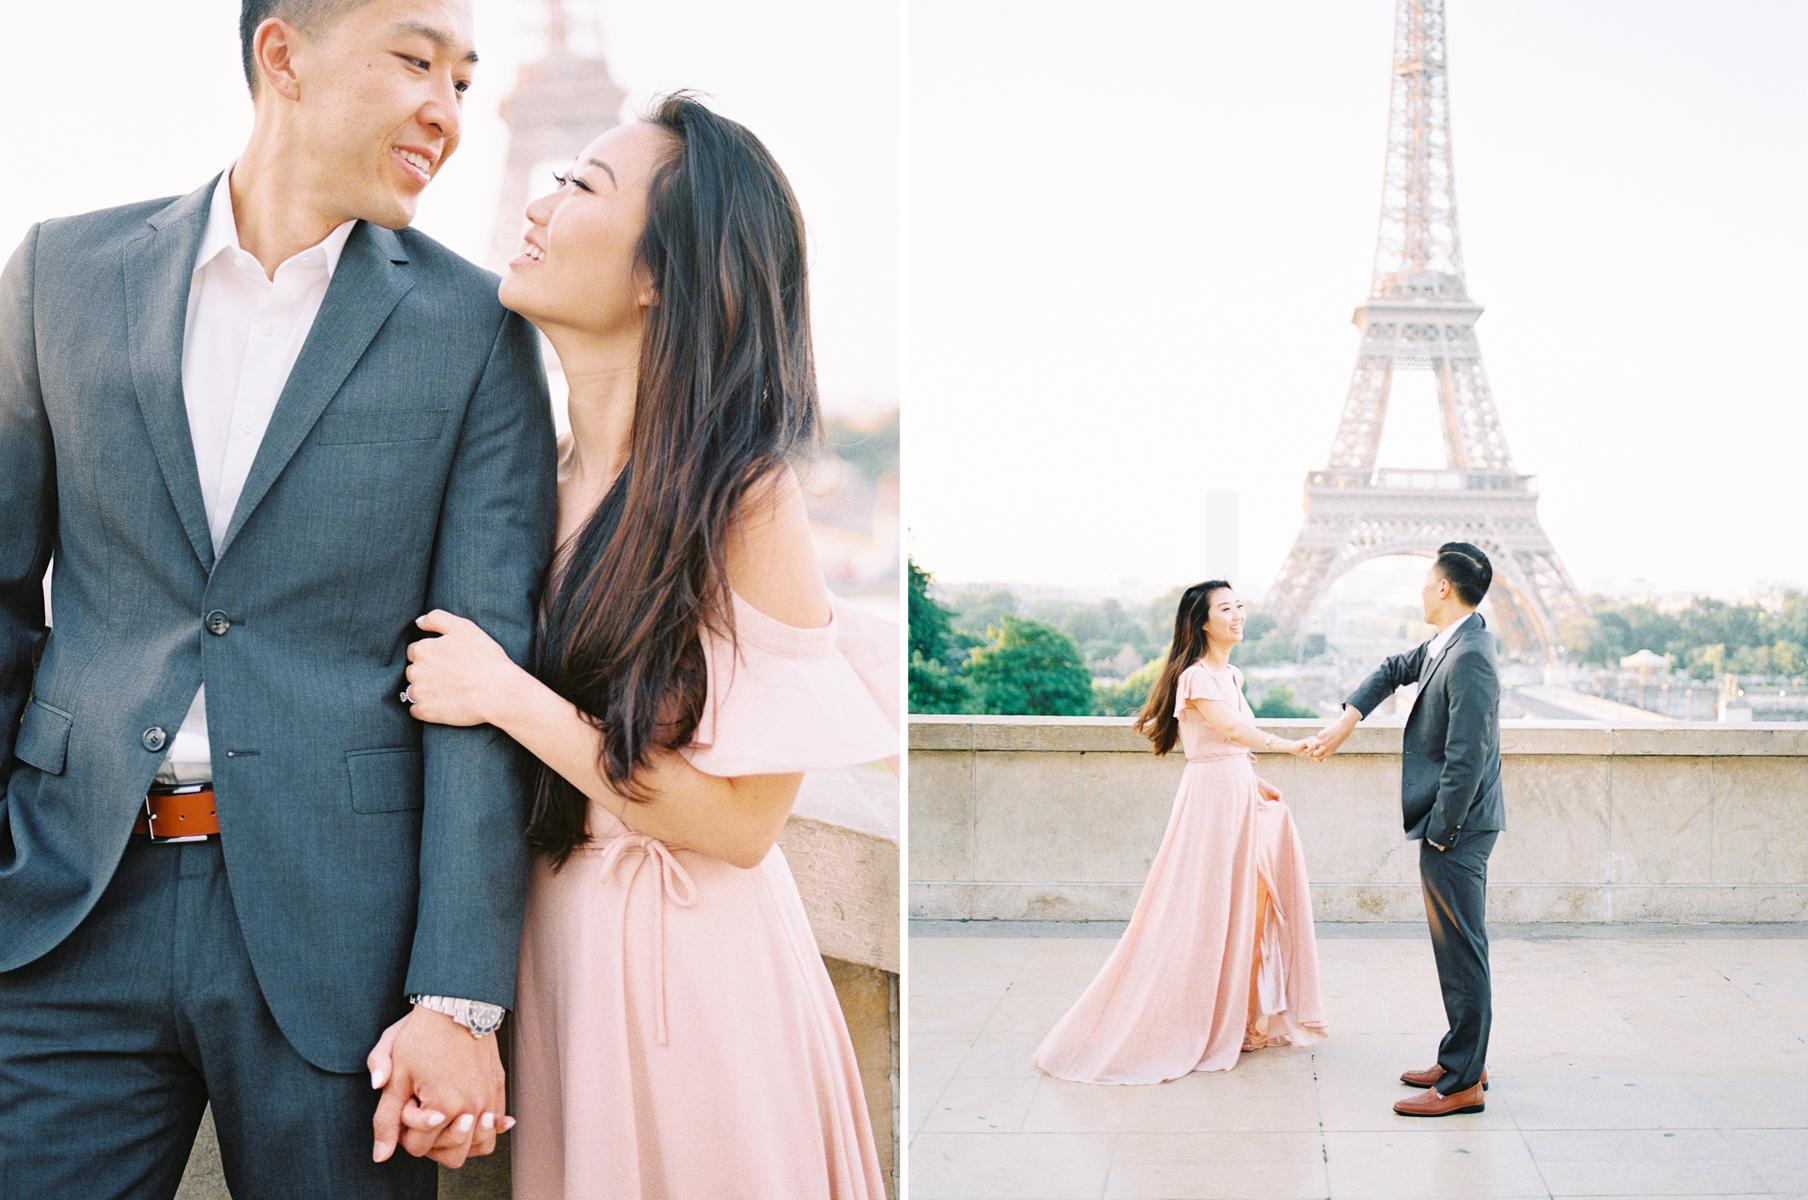 AKP_Paris_Honeymoon_Shoot_Film_Photographer-3.jpg